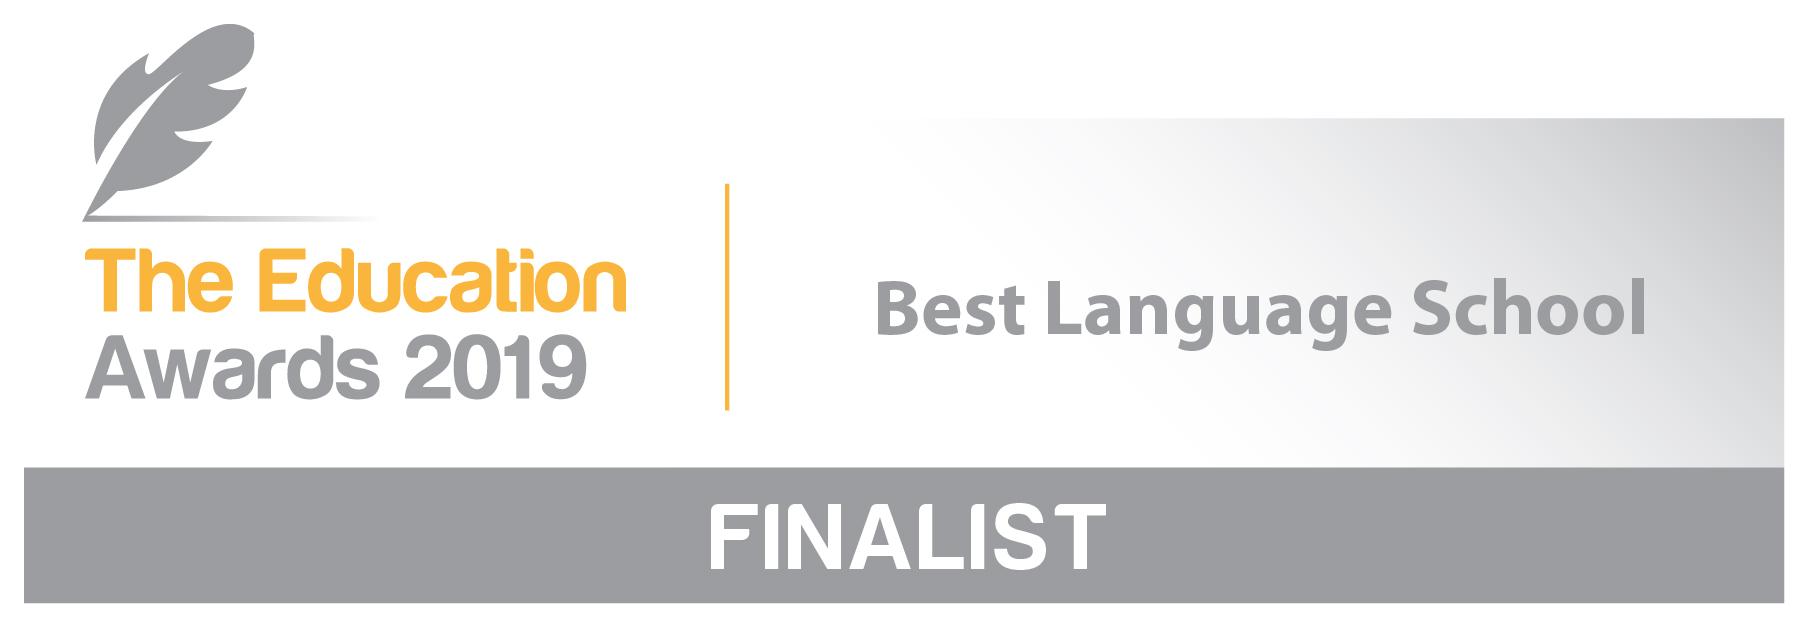 Best Language School Cork